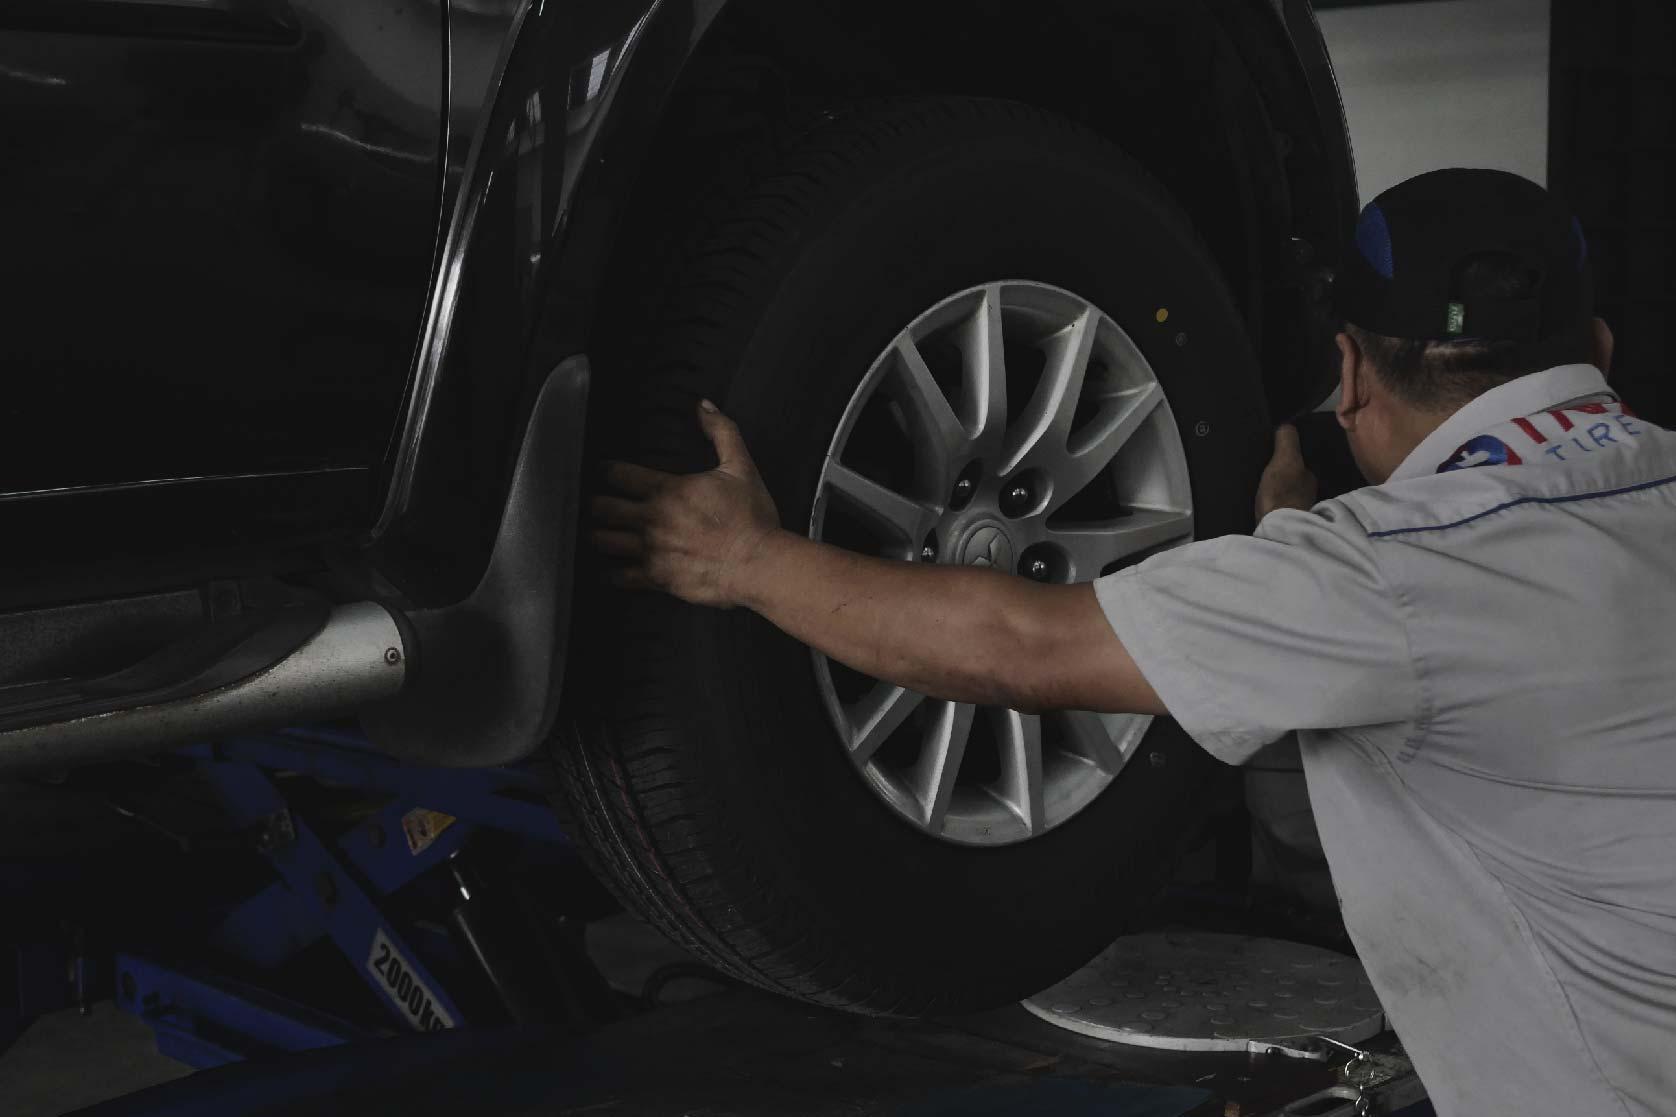 tripanca_tire_service_repairbandotcom_blog_5